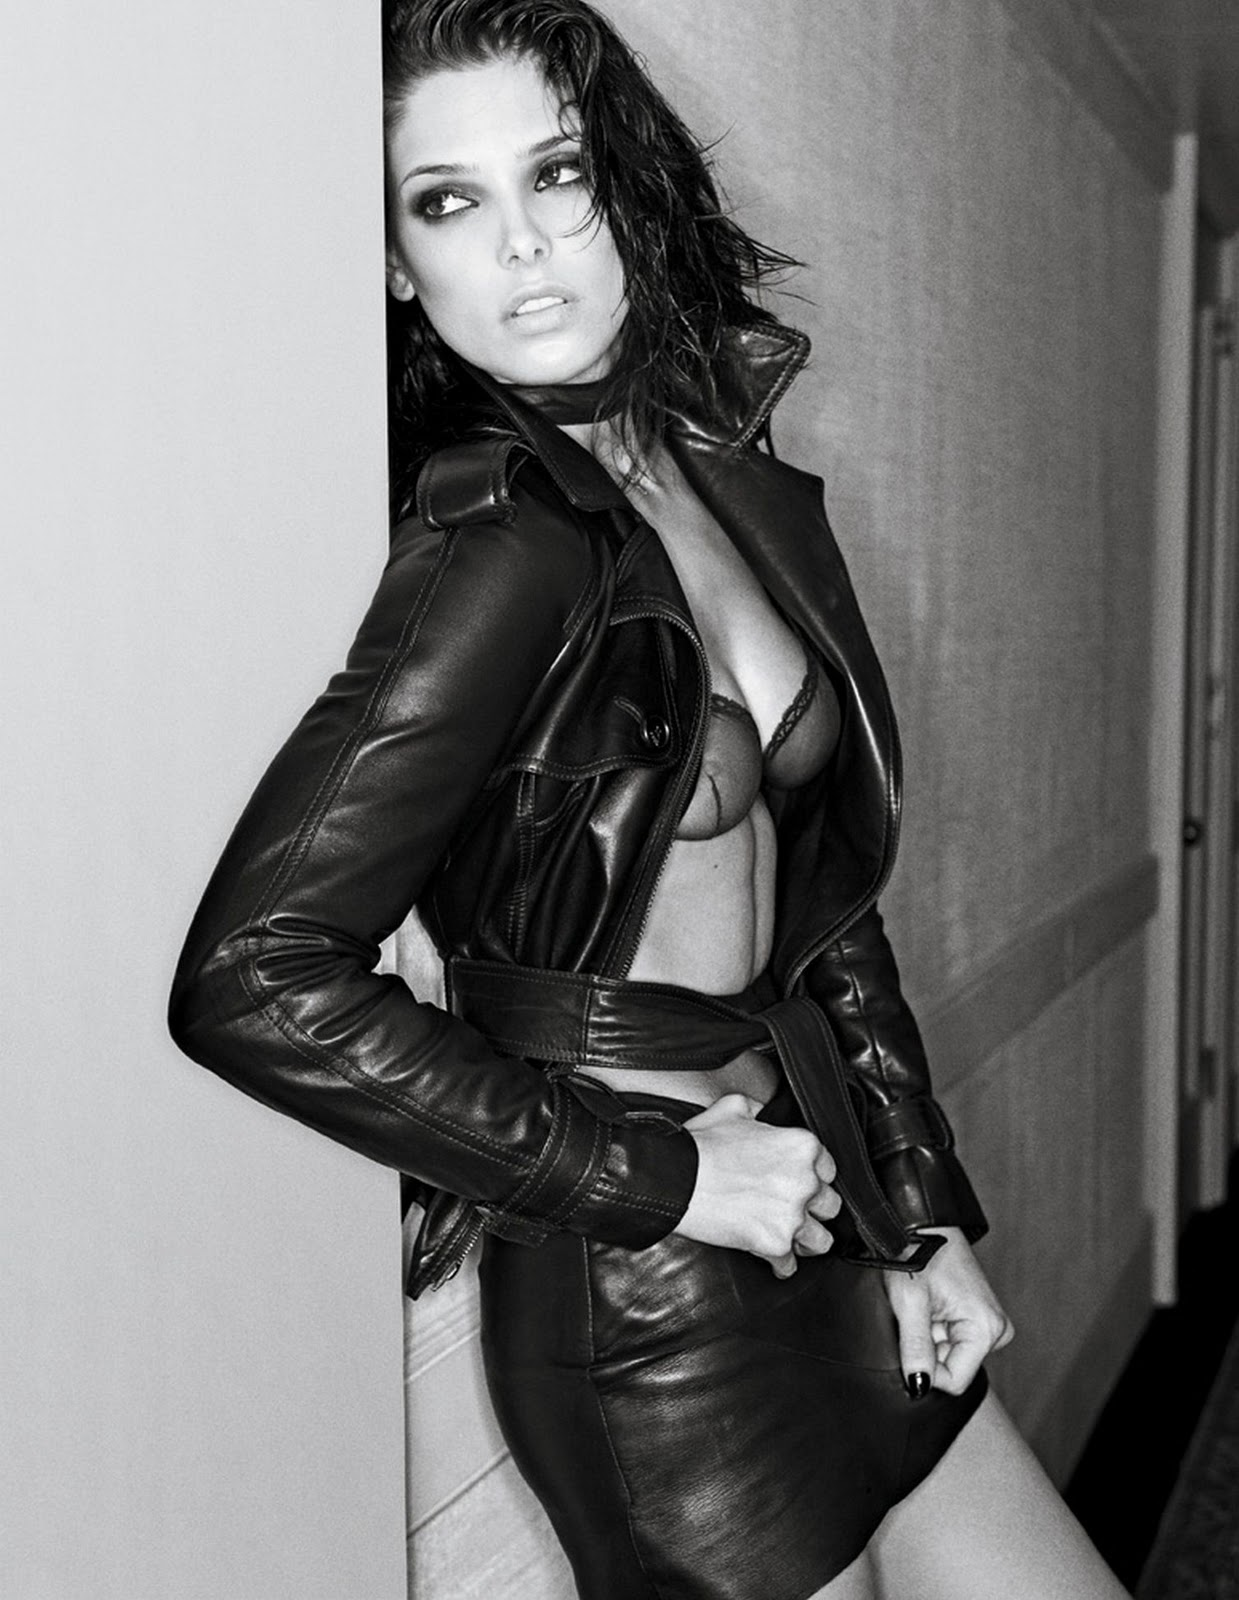 http://4.bp.blogspot.com/_y8J7CIWccNc/TRpSHJZDmBI/AAAAAAAADEI/RY0FpLQ05LE/s1600/Ashley-Greene.jpg